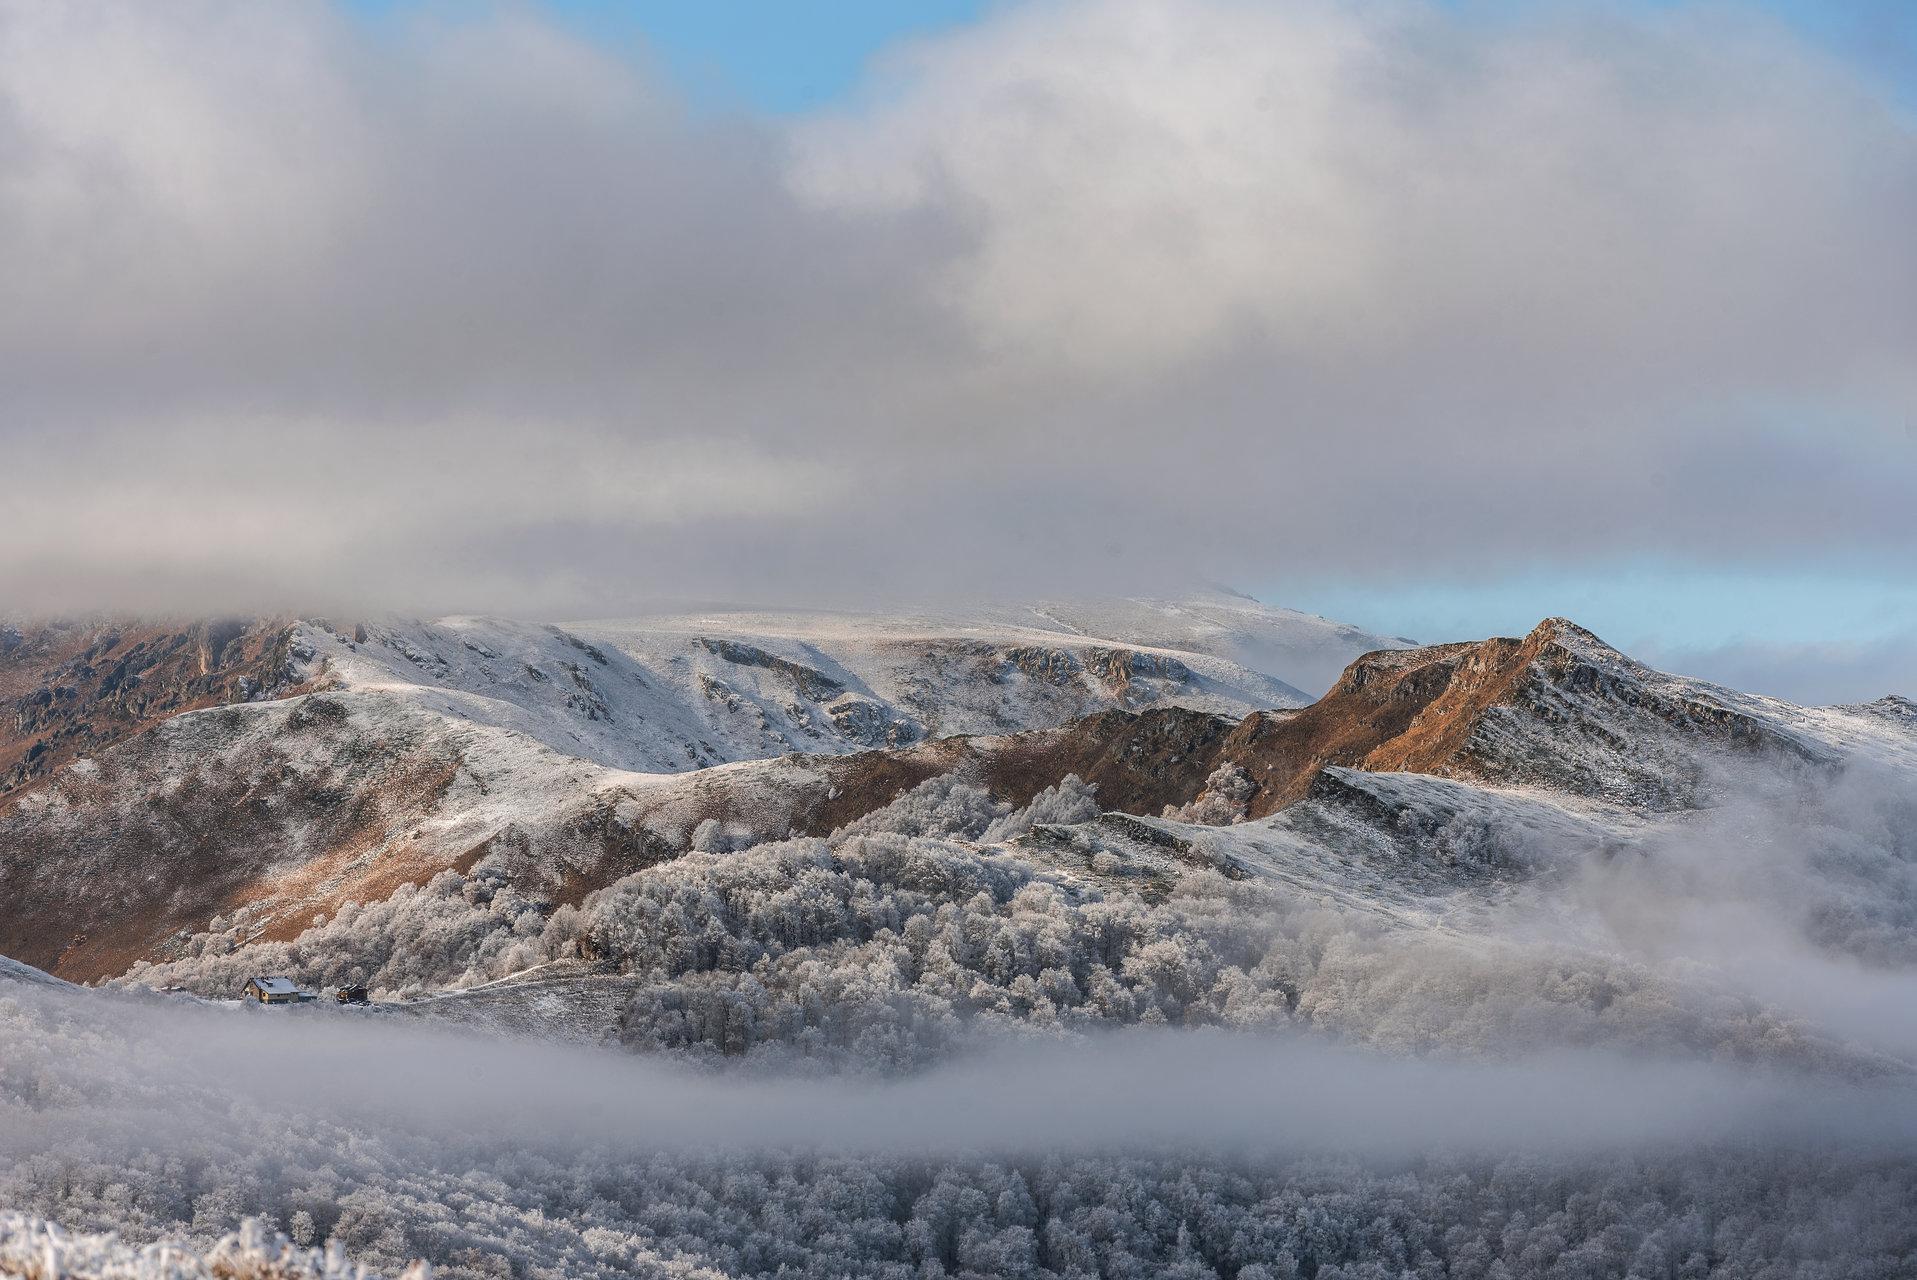 Хижа Мазалат и връх Вълча глава на фона на масив Триглав | Author mitko karakolev - TISEOS | PHOTO FORUM